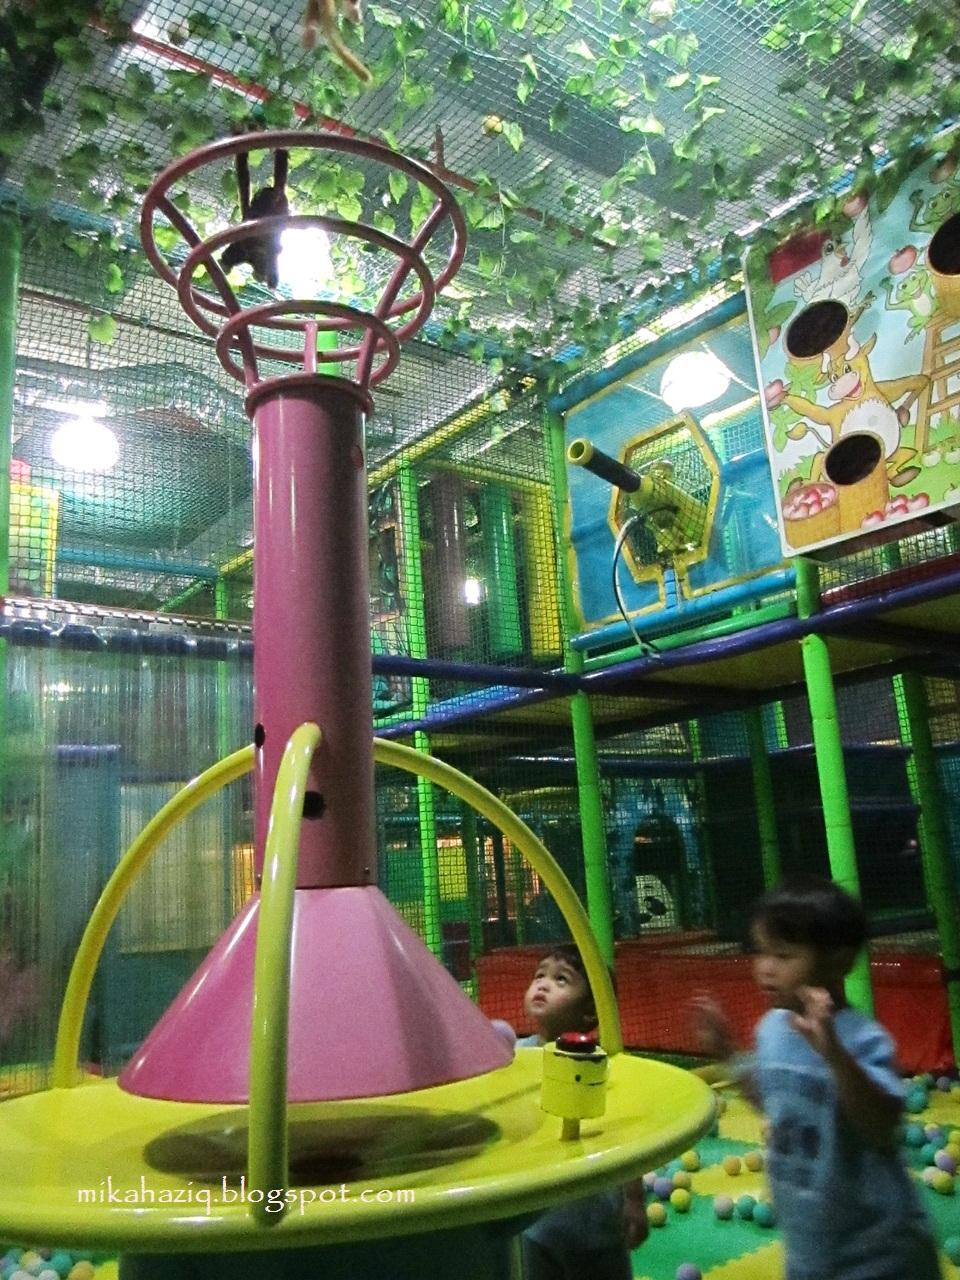 mikahaziq Indoor Play Jungle Gym Bangsar